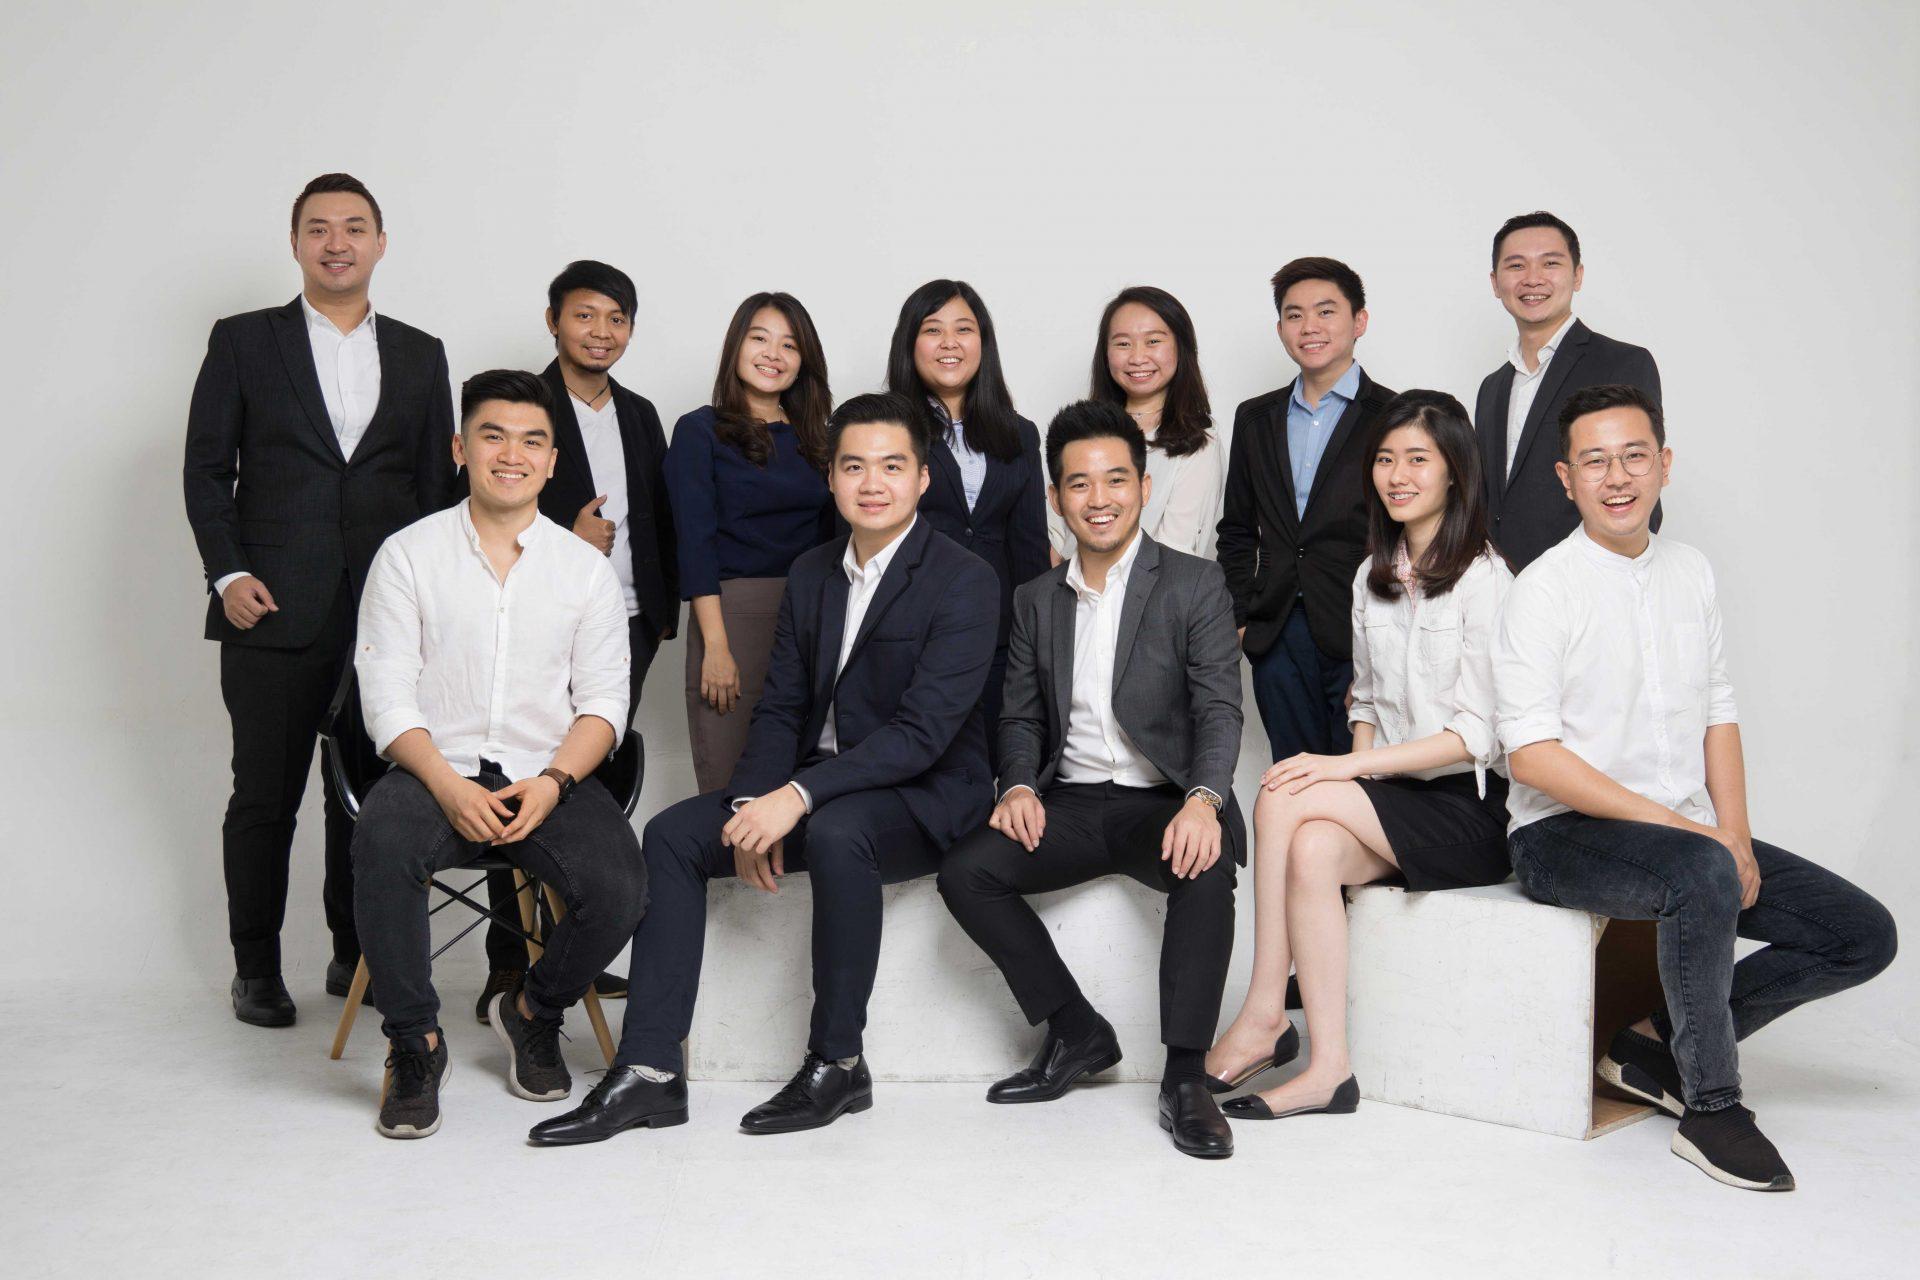 Team Branding Support Asia